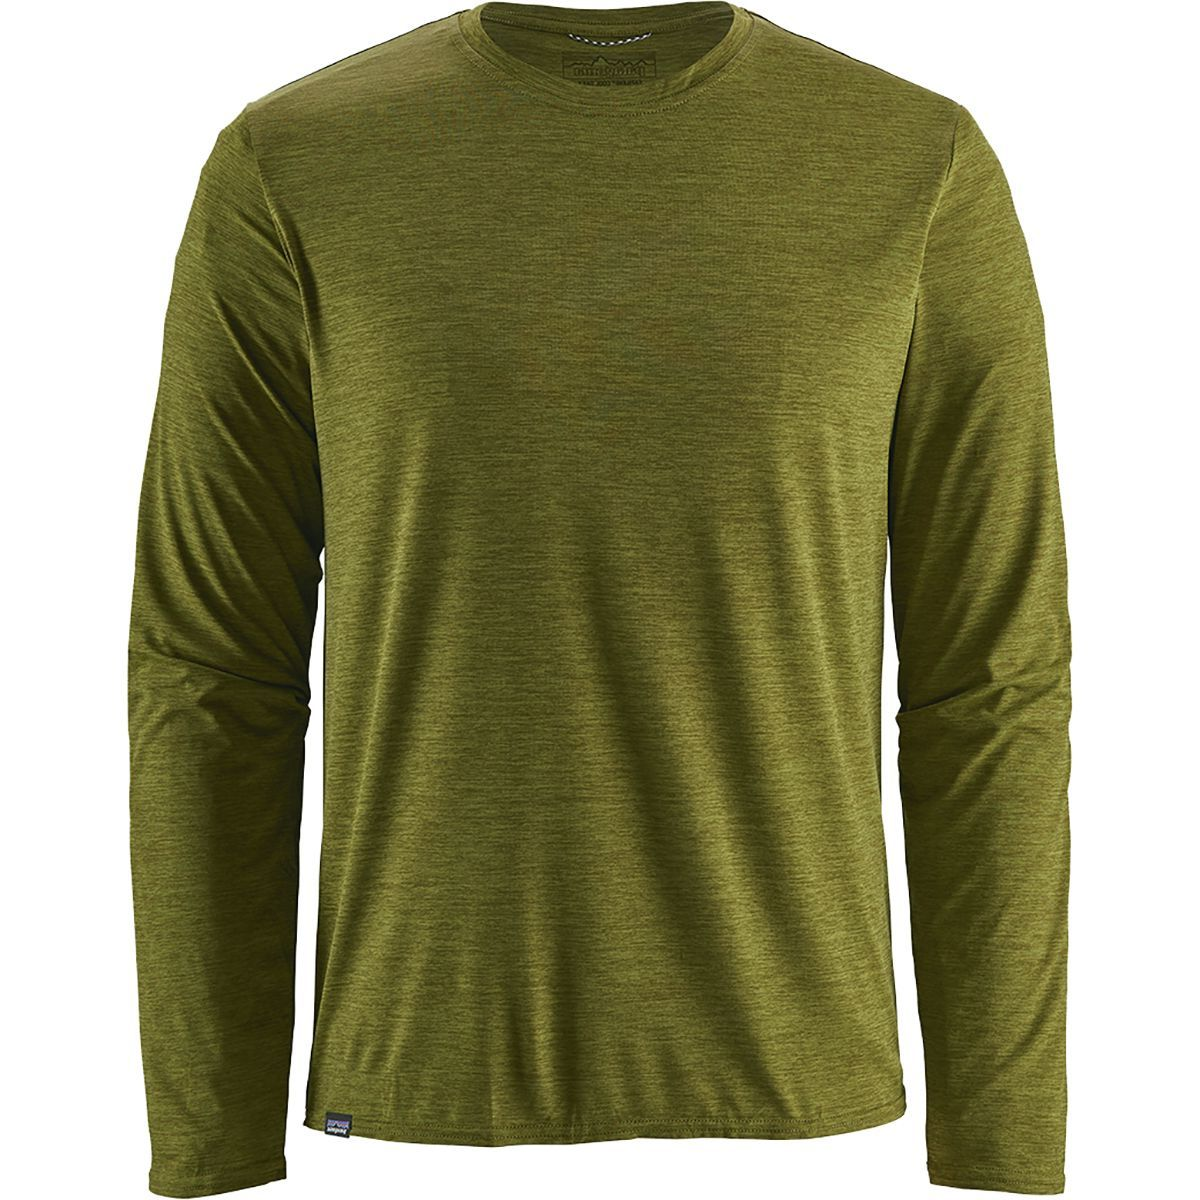 Patagonia Capilene Cool Daily Long-Sleeve Shirt - Men's